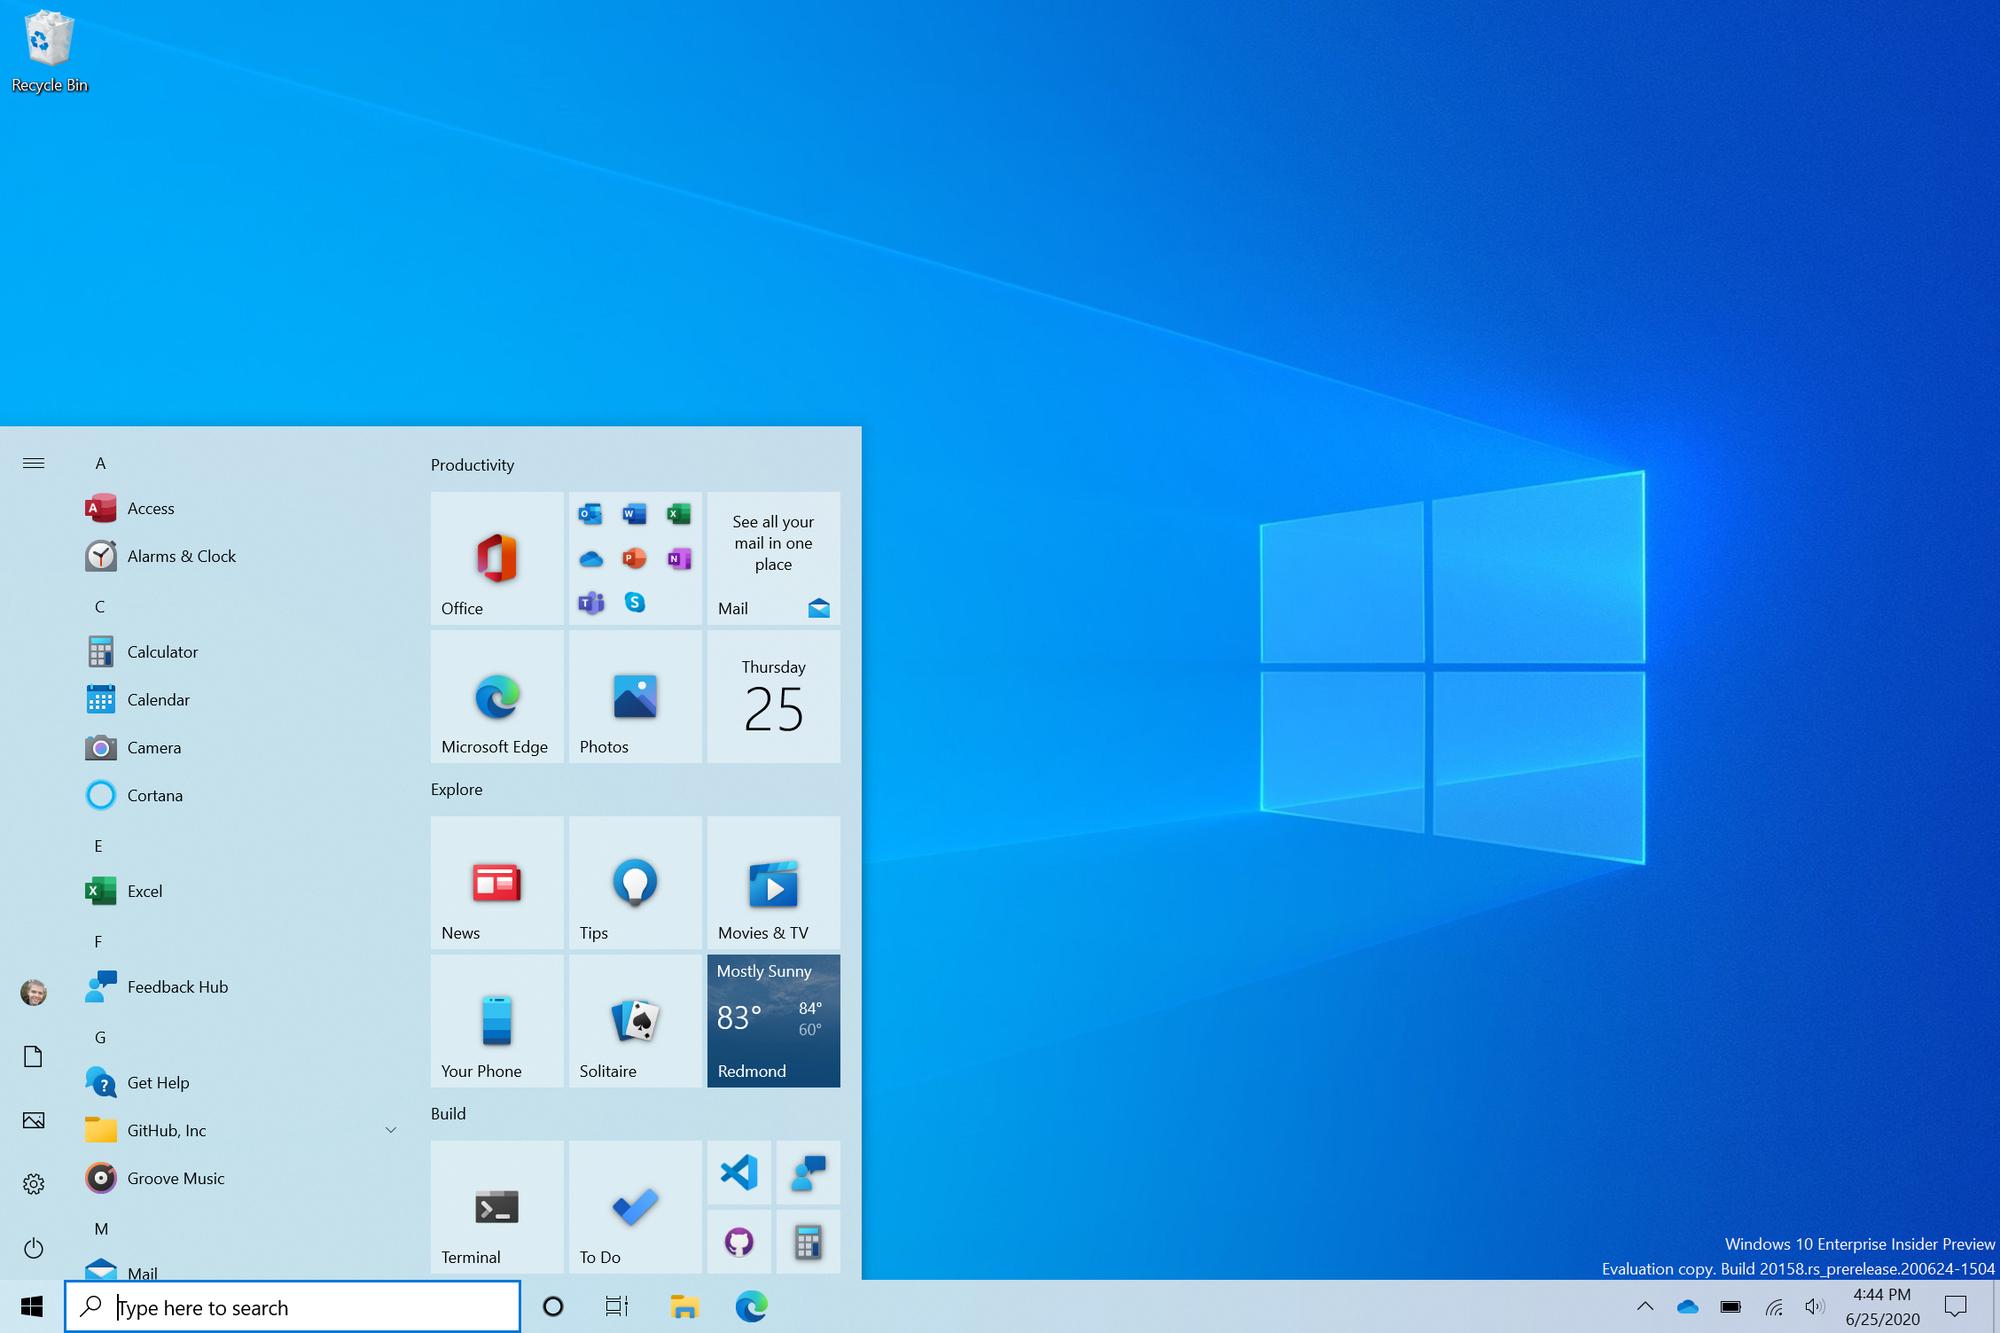 Windows 10 Insider Preview Build 20161.1000 (rs_prerelease) - July 1 de00b149b94ec99619dfc491196f314e.png